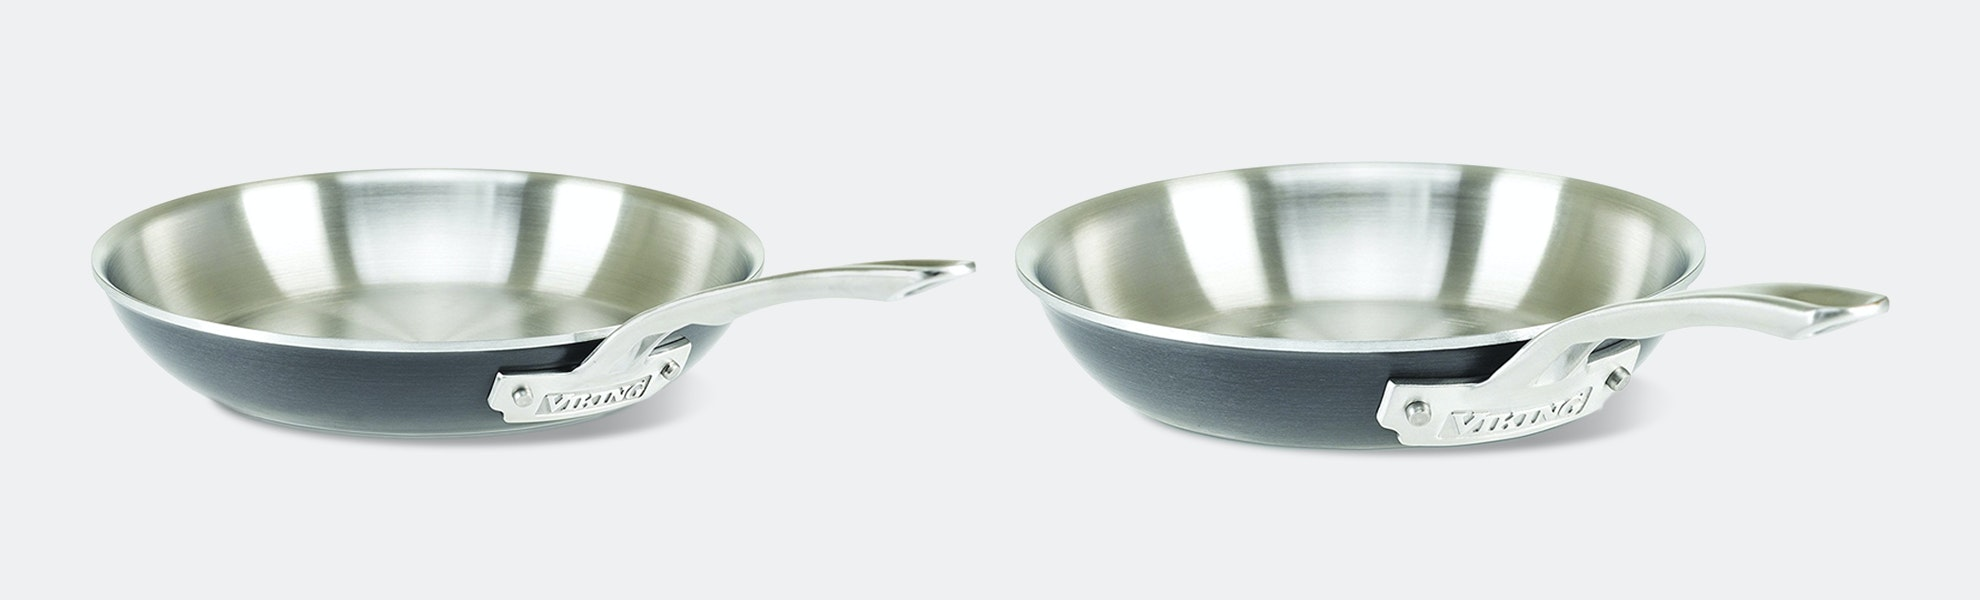 Viking Hard Stainless 5-Ply Fry Pans